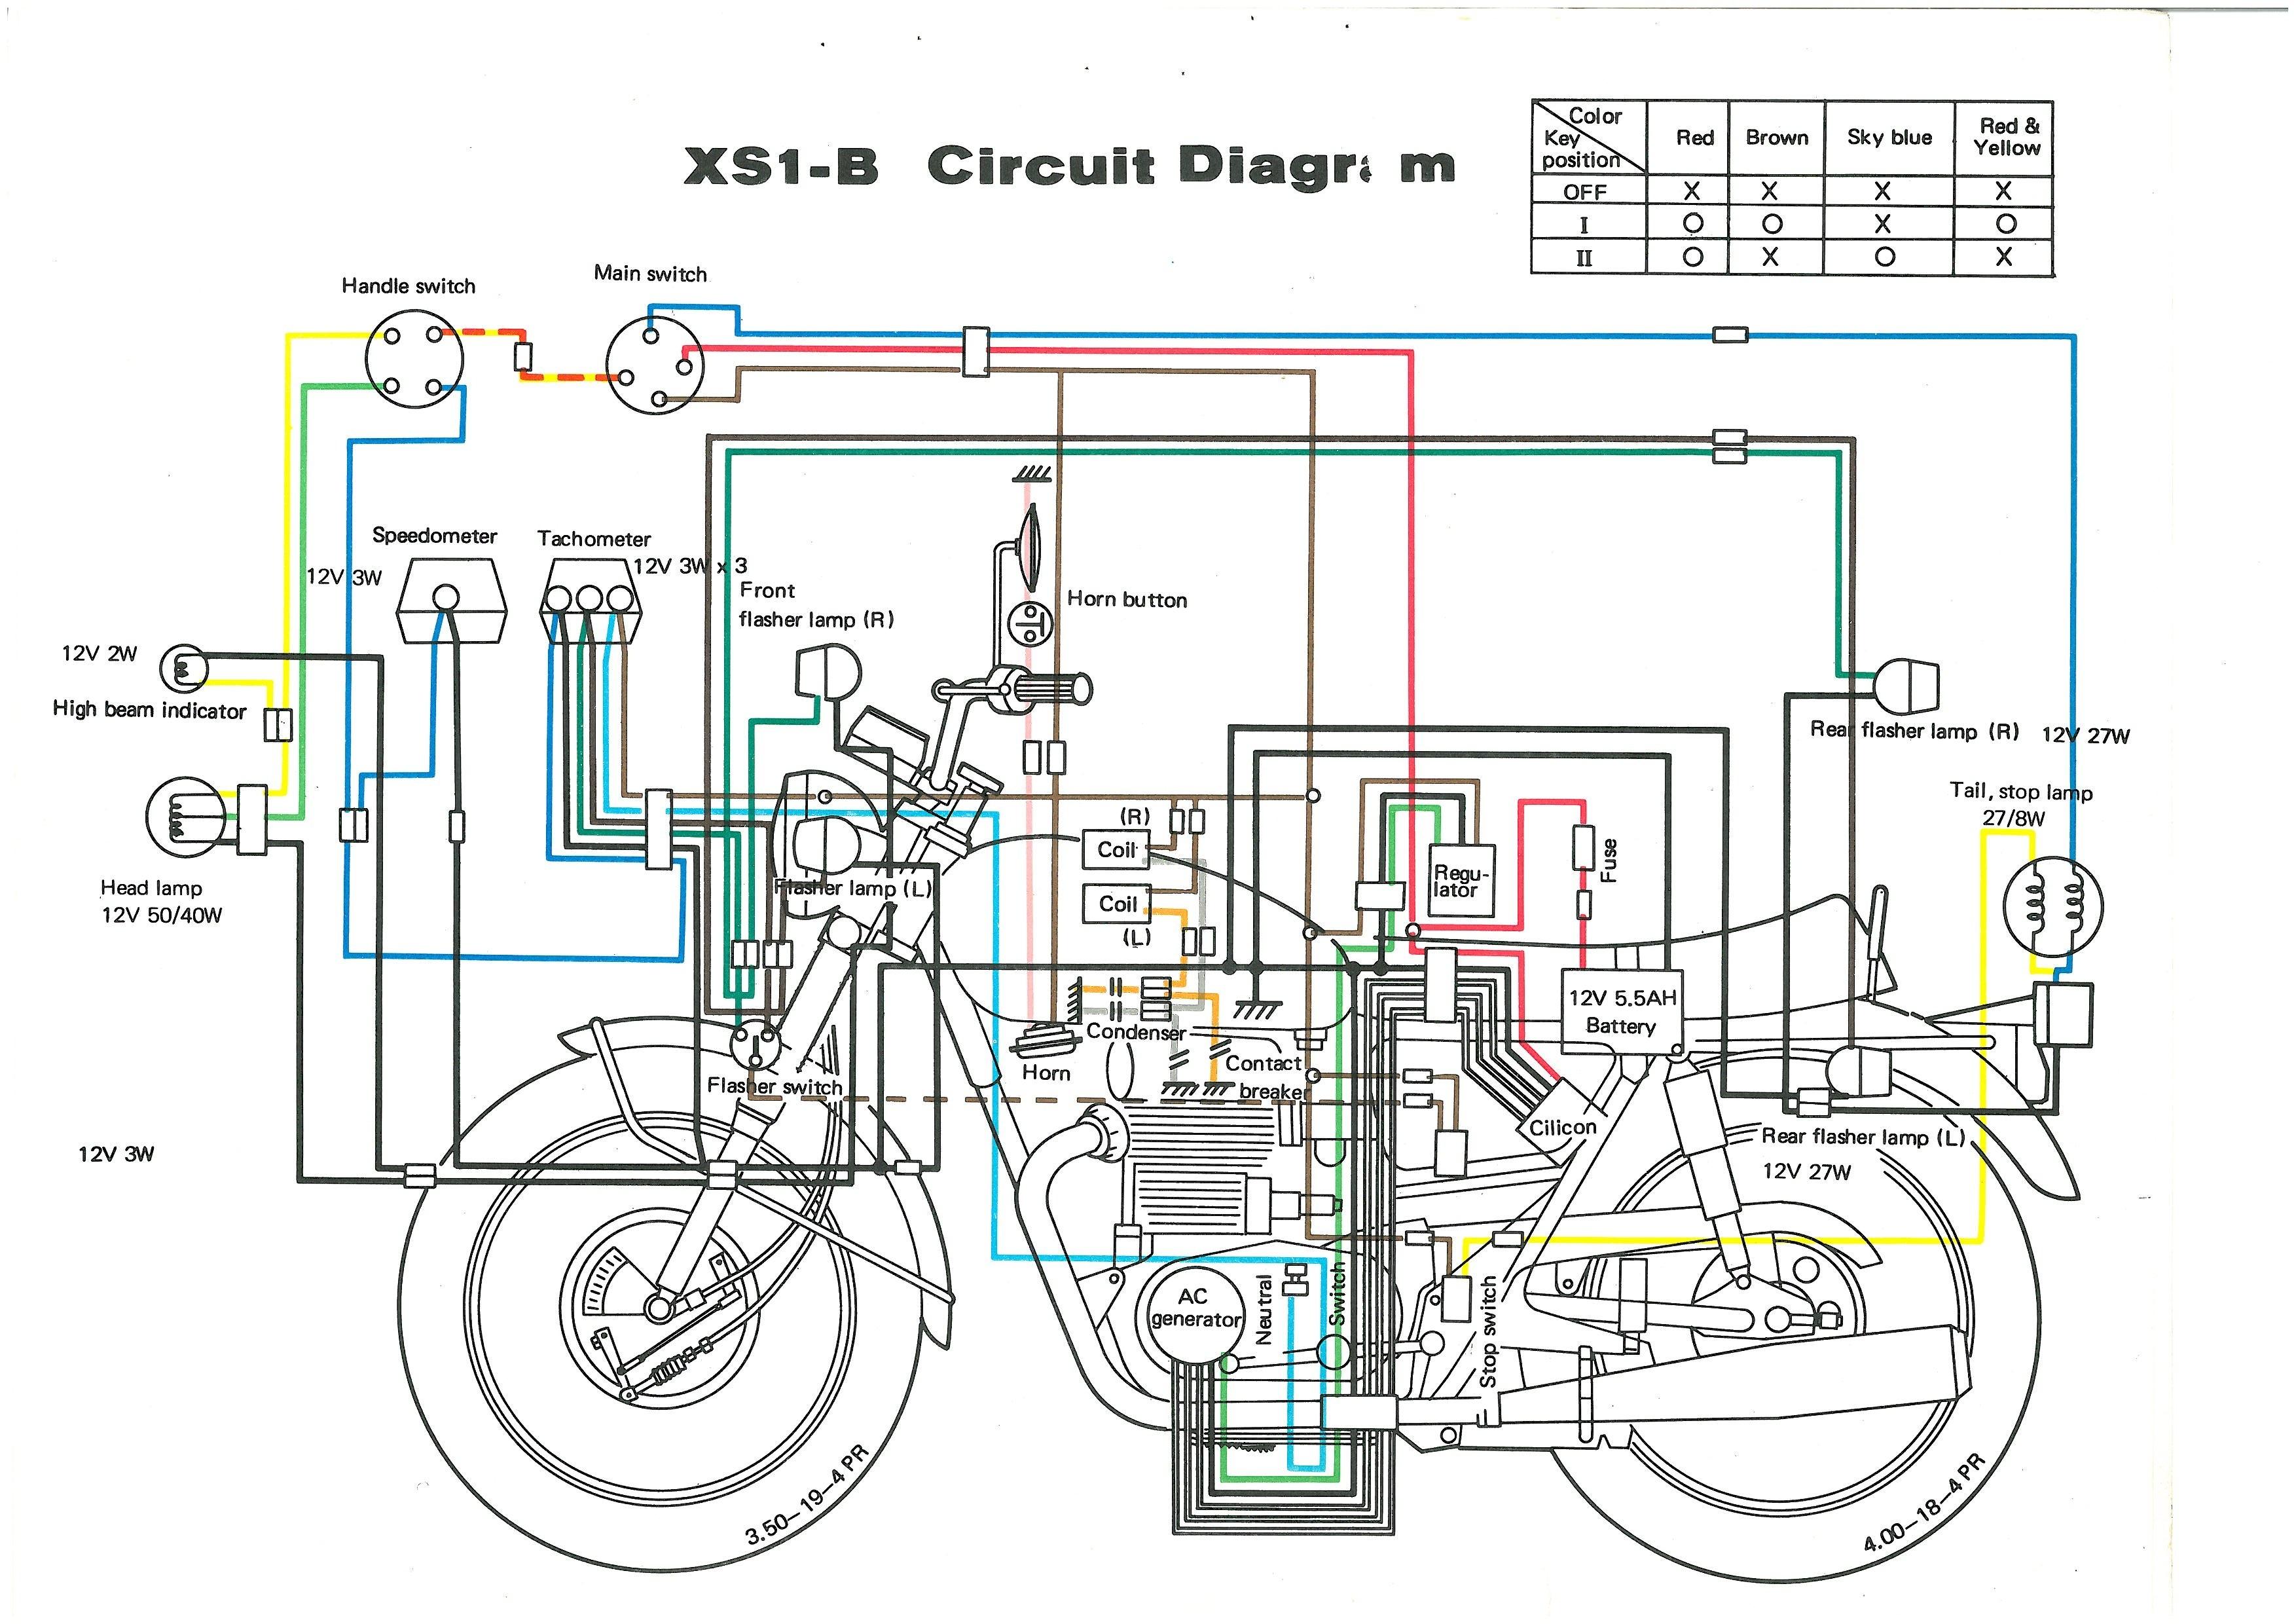 Yamaha Xs650 Chopper Wiring Diagram hobbiesxstyle